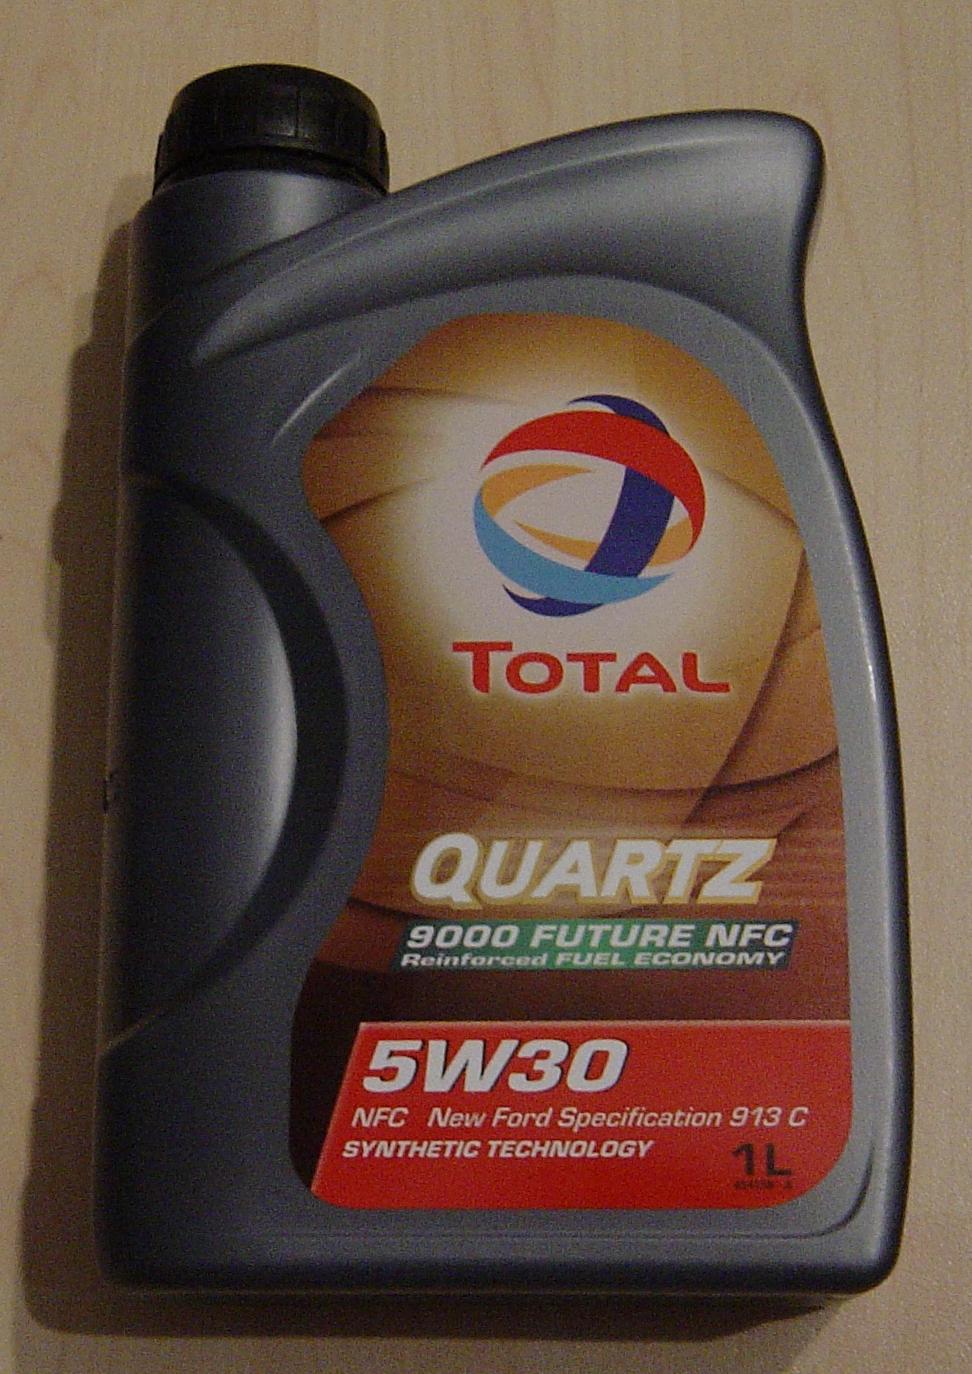 Total Quartz 9000 Future NFC 5W30 (Ford)